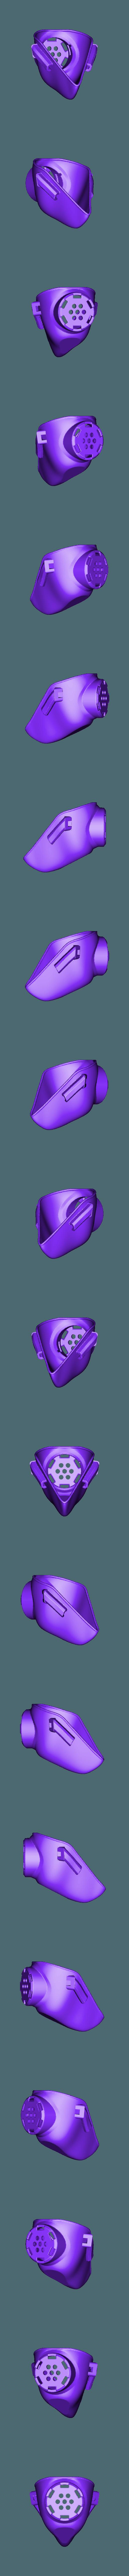 Mask_mark 2.stl Download free STL file Mask 3D NanoHack 2.0 • 3D printer design, Tonystark112